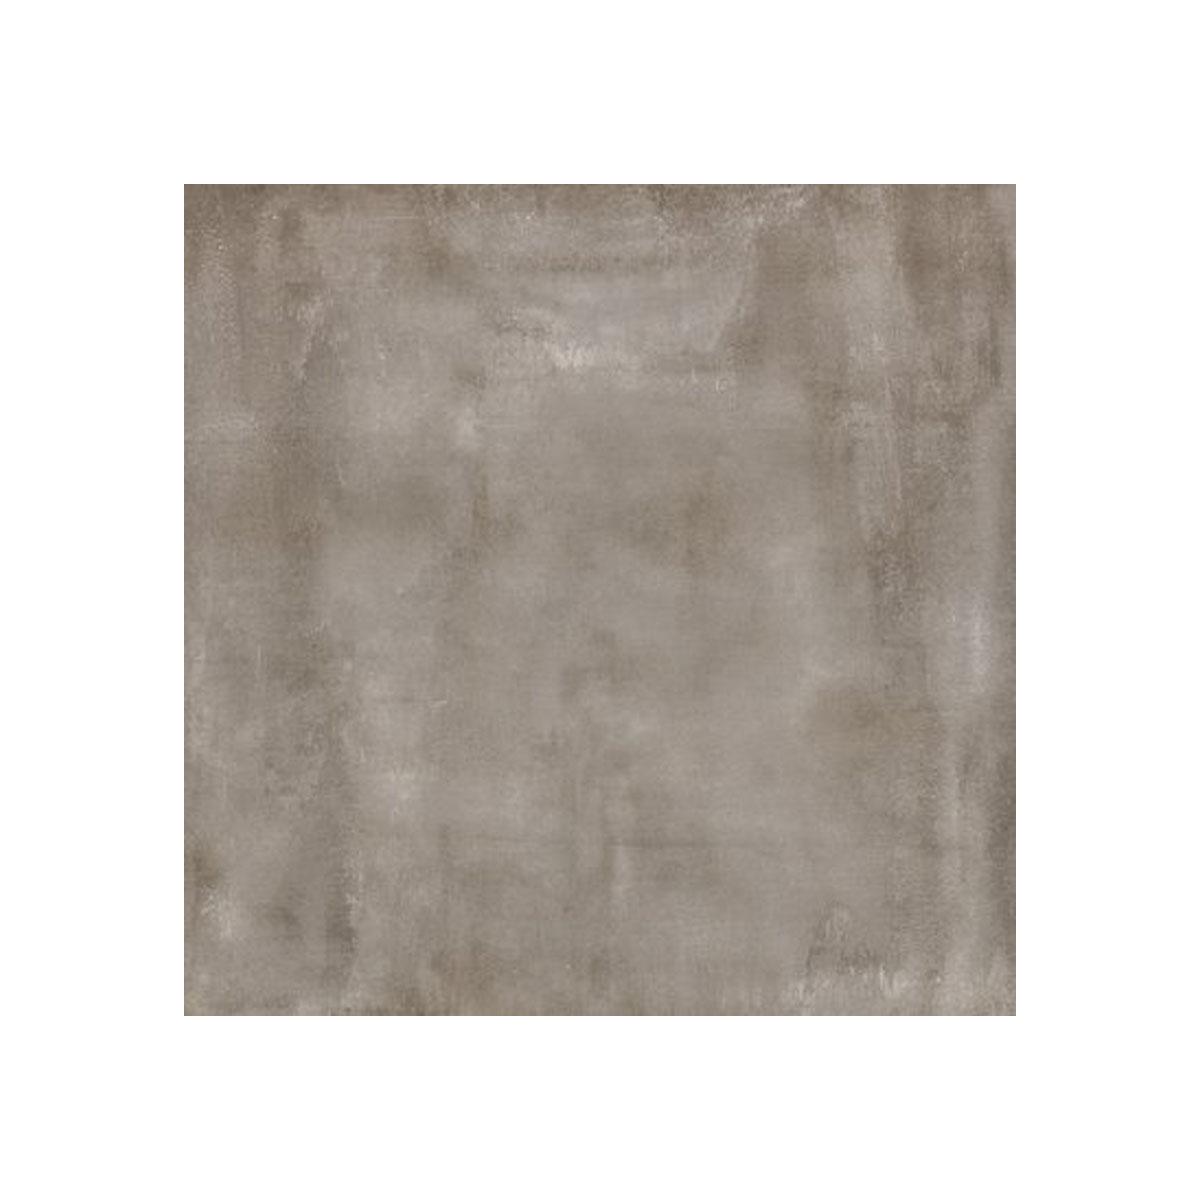 Basic Concrete - Dark Grey - 750x750mm - Concrete Look Tiles - Stone3 Brisbane